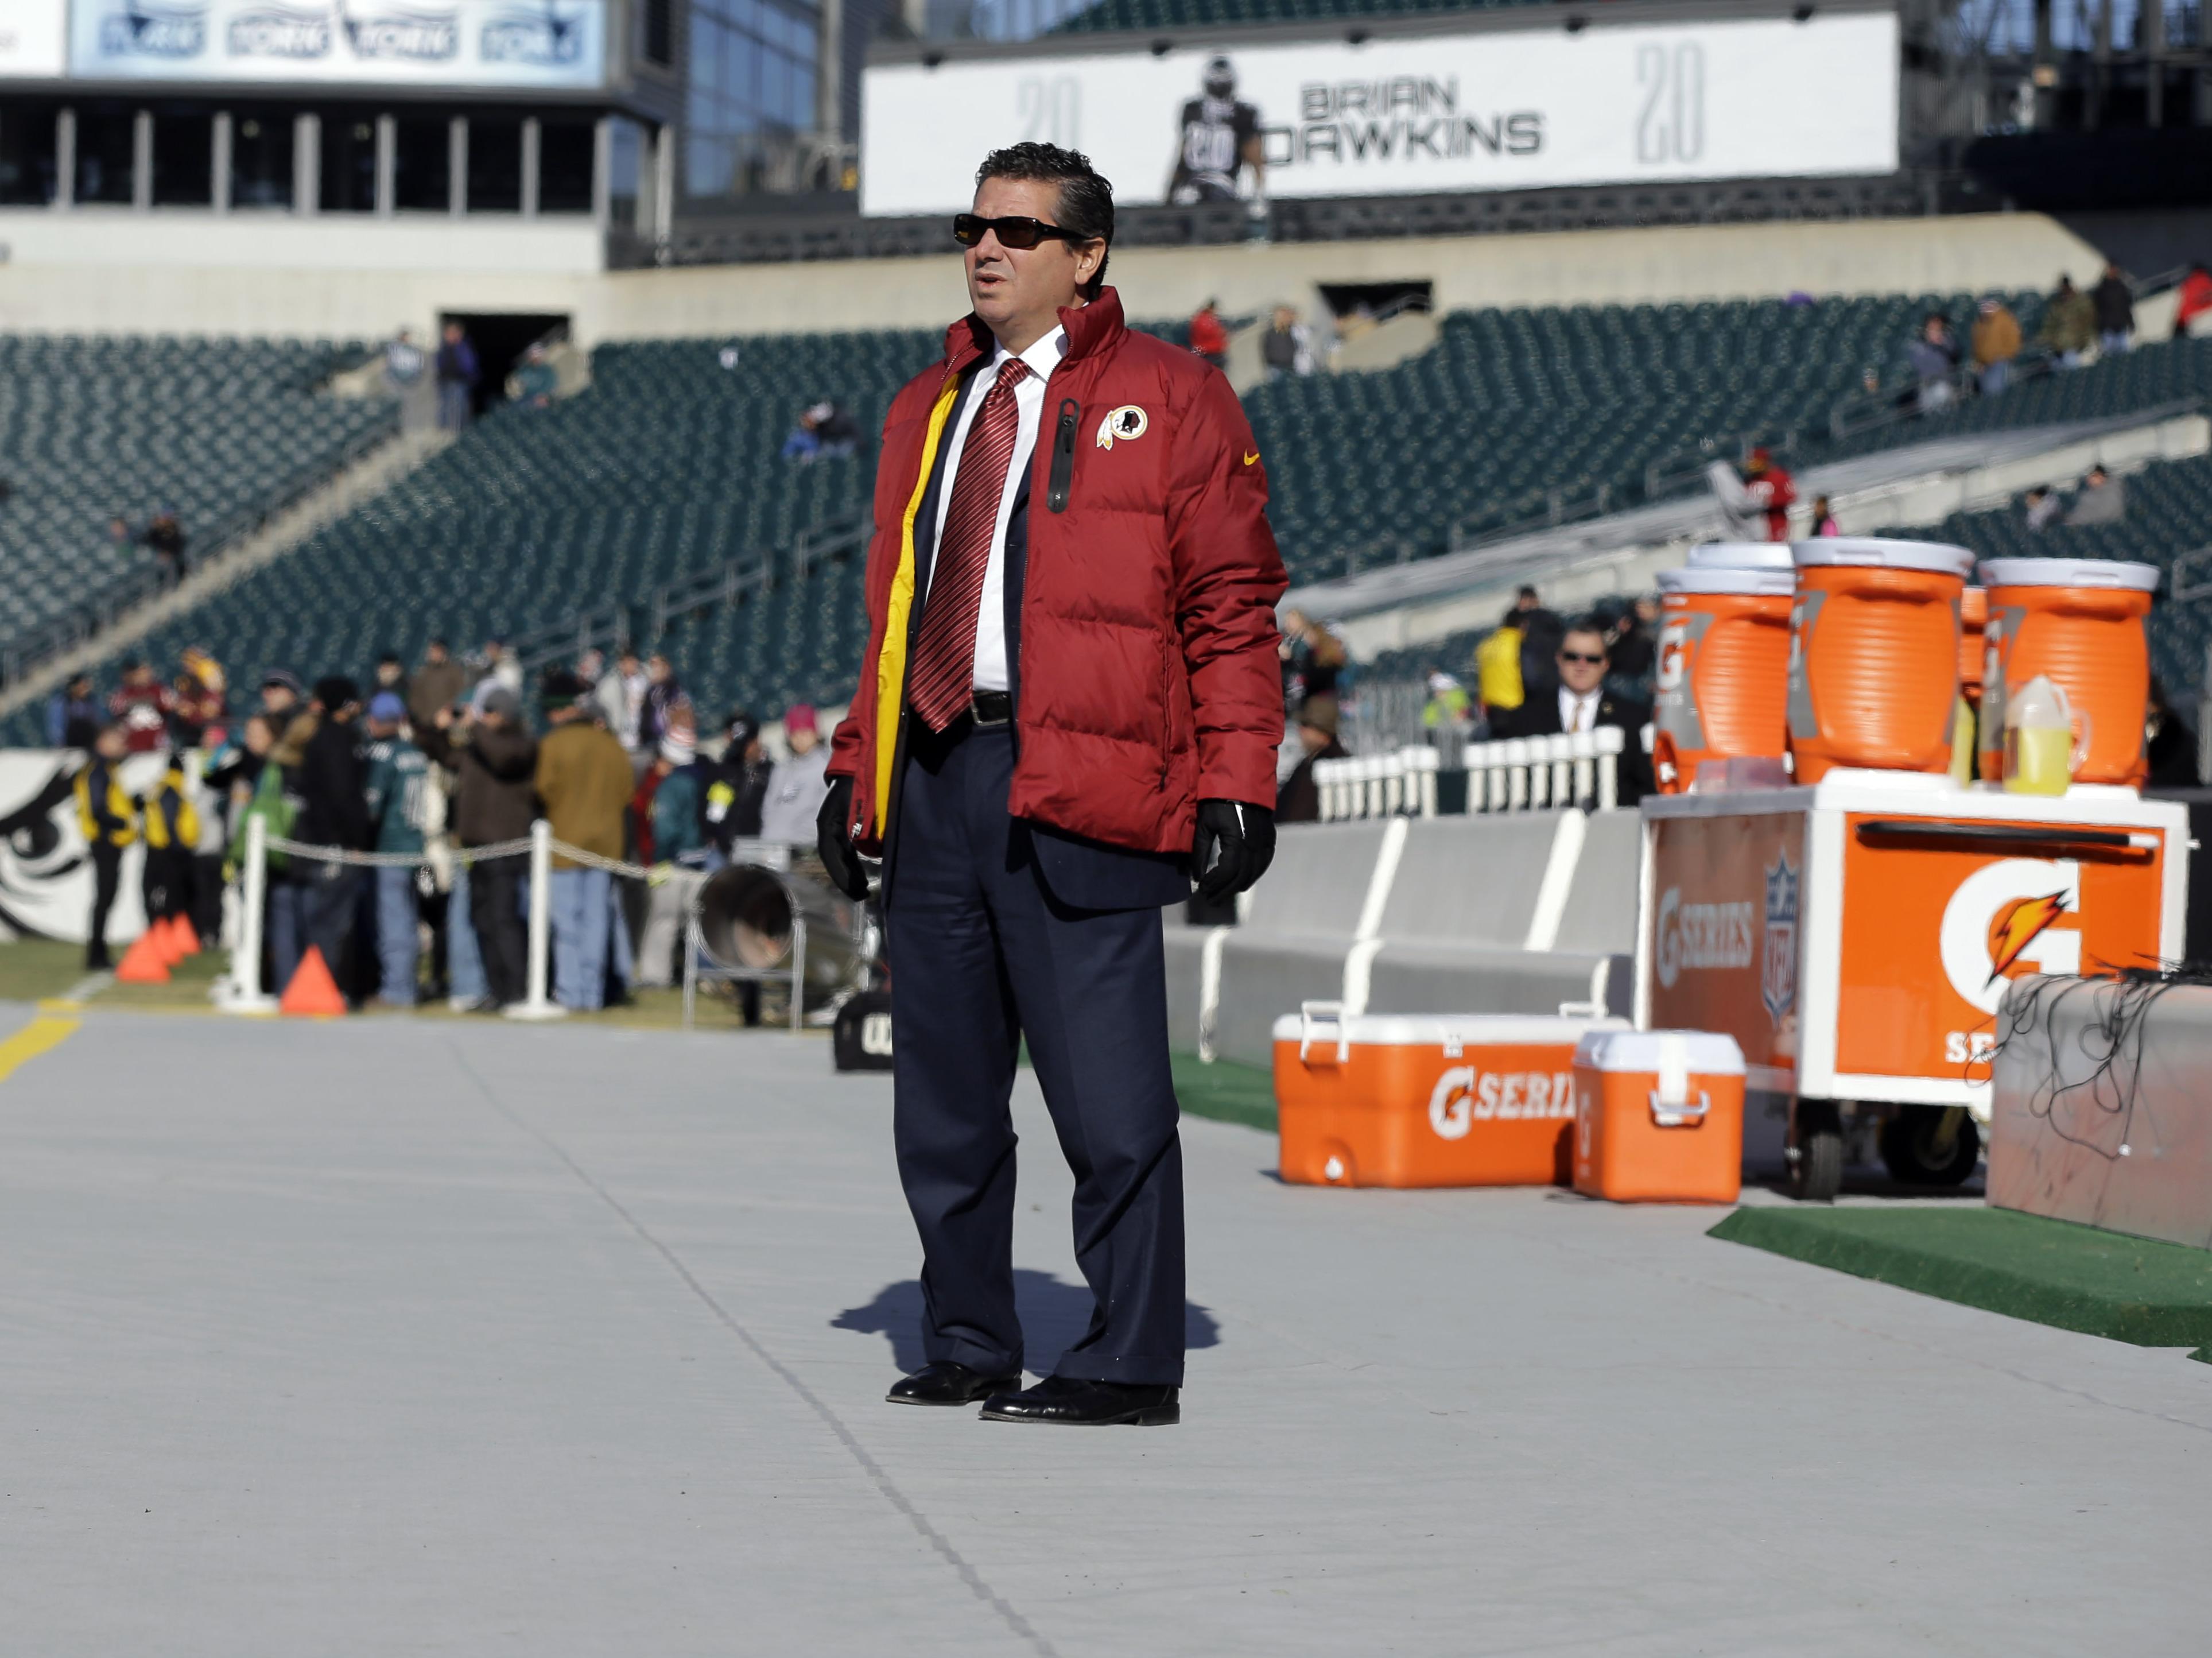 Redskins Team Owner Launches Program For Natives, Flotilla Of Side-Eyes